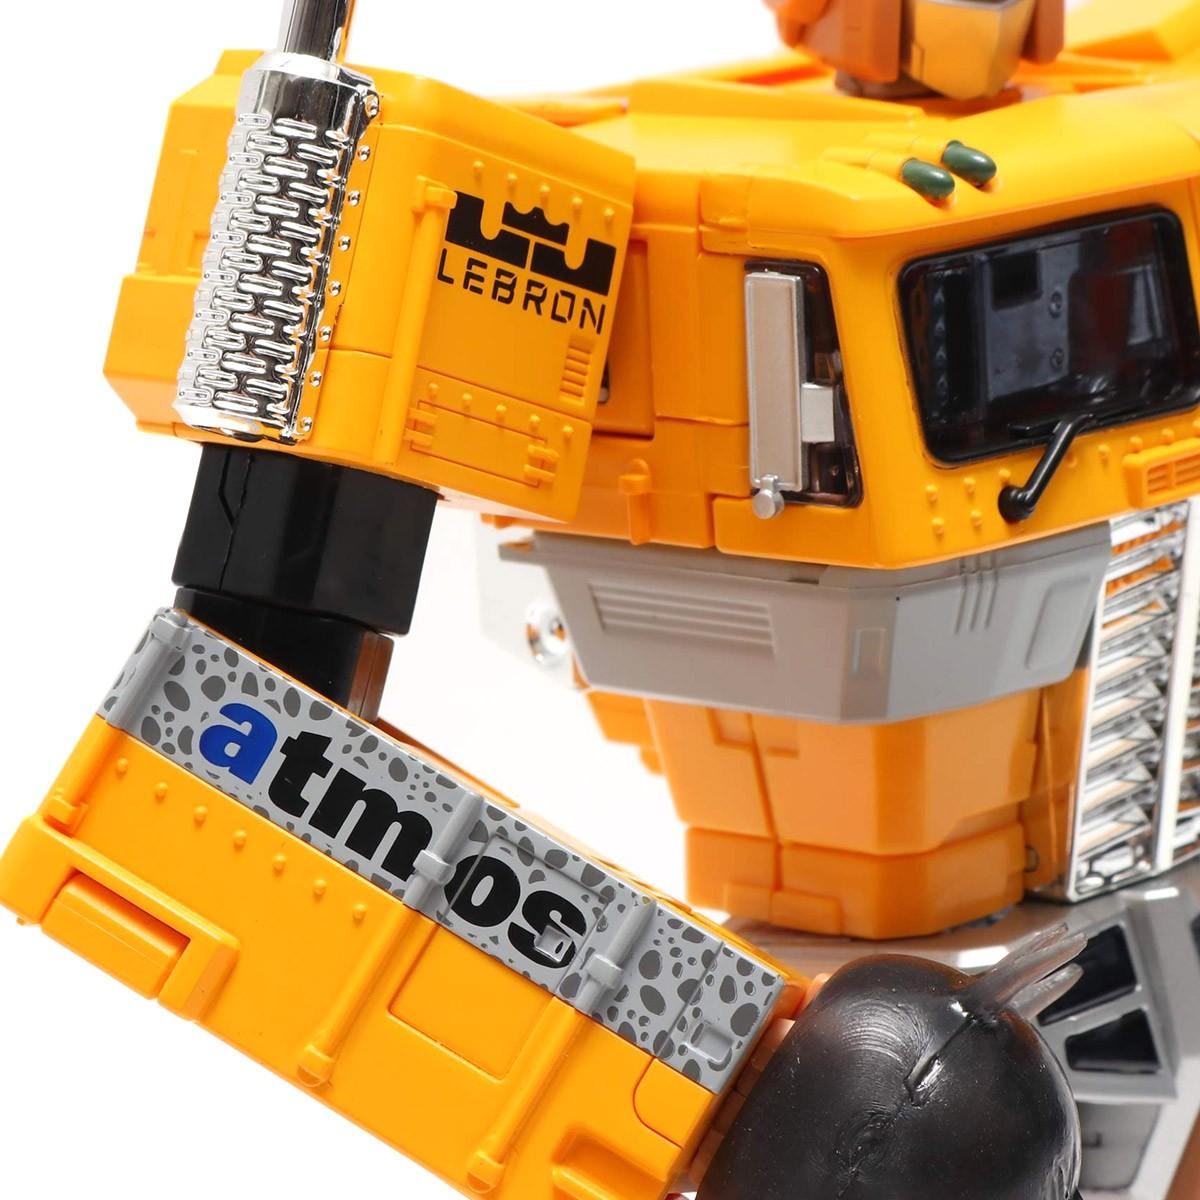 Transformers News: Masterpiece MP 10 Convoy x Atmos Safari Lebron Version Revealed